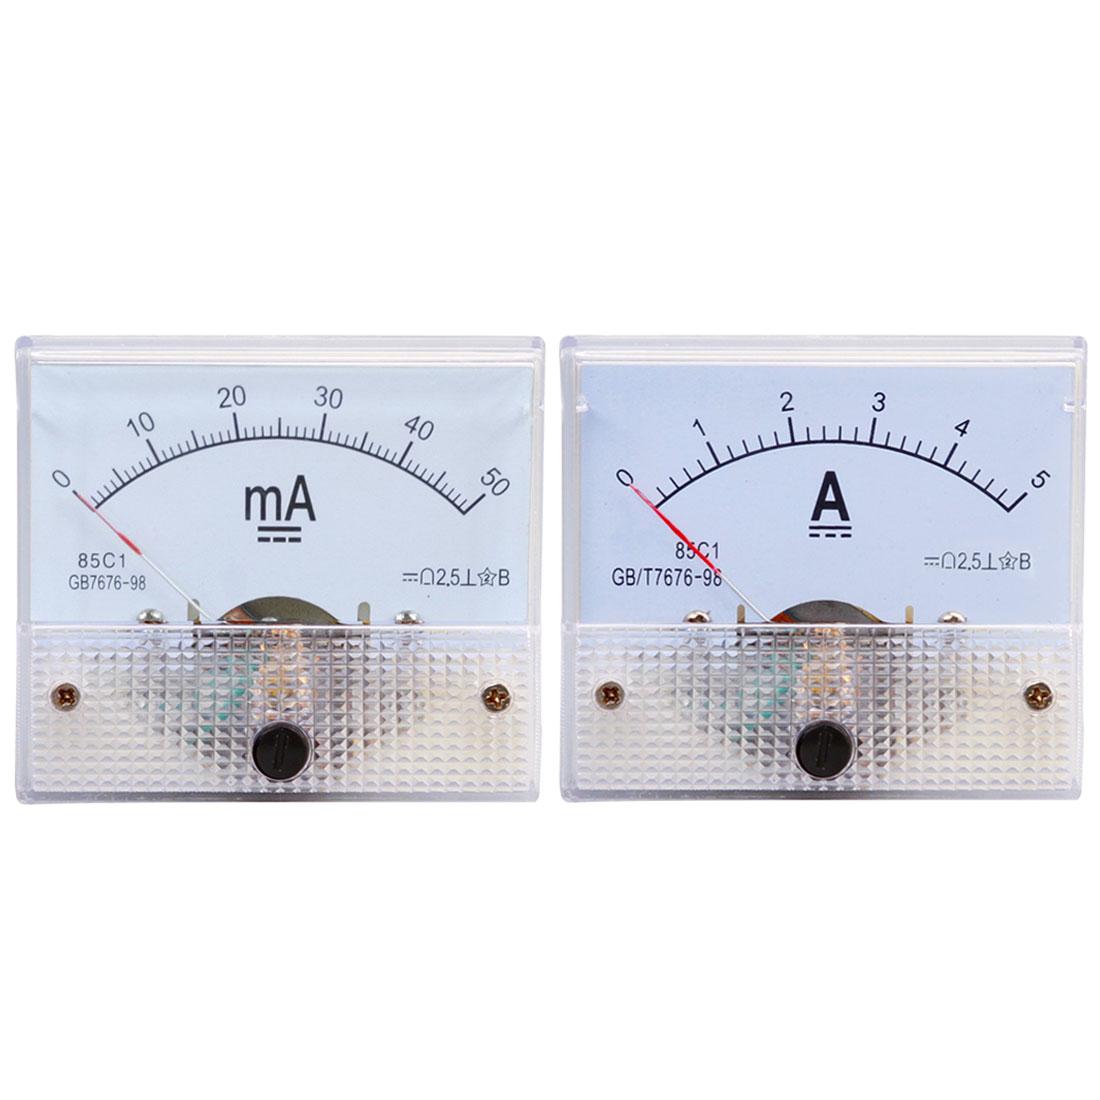 DC Pointer Current Meter 5A/10A/15A/20A/30A/50A/75A/100A Analog Ammeter Panel Current Meter Gauge l4969urd automotive computer board